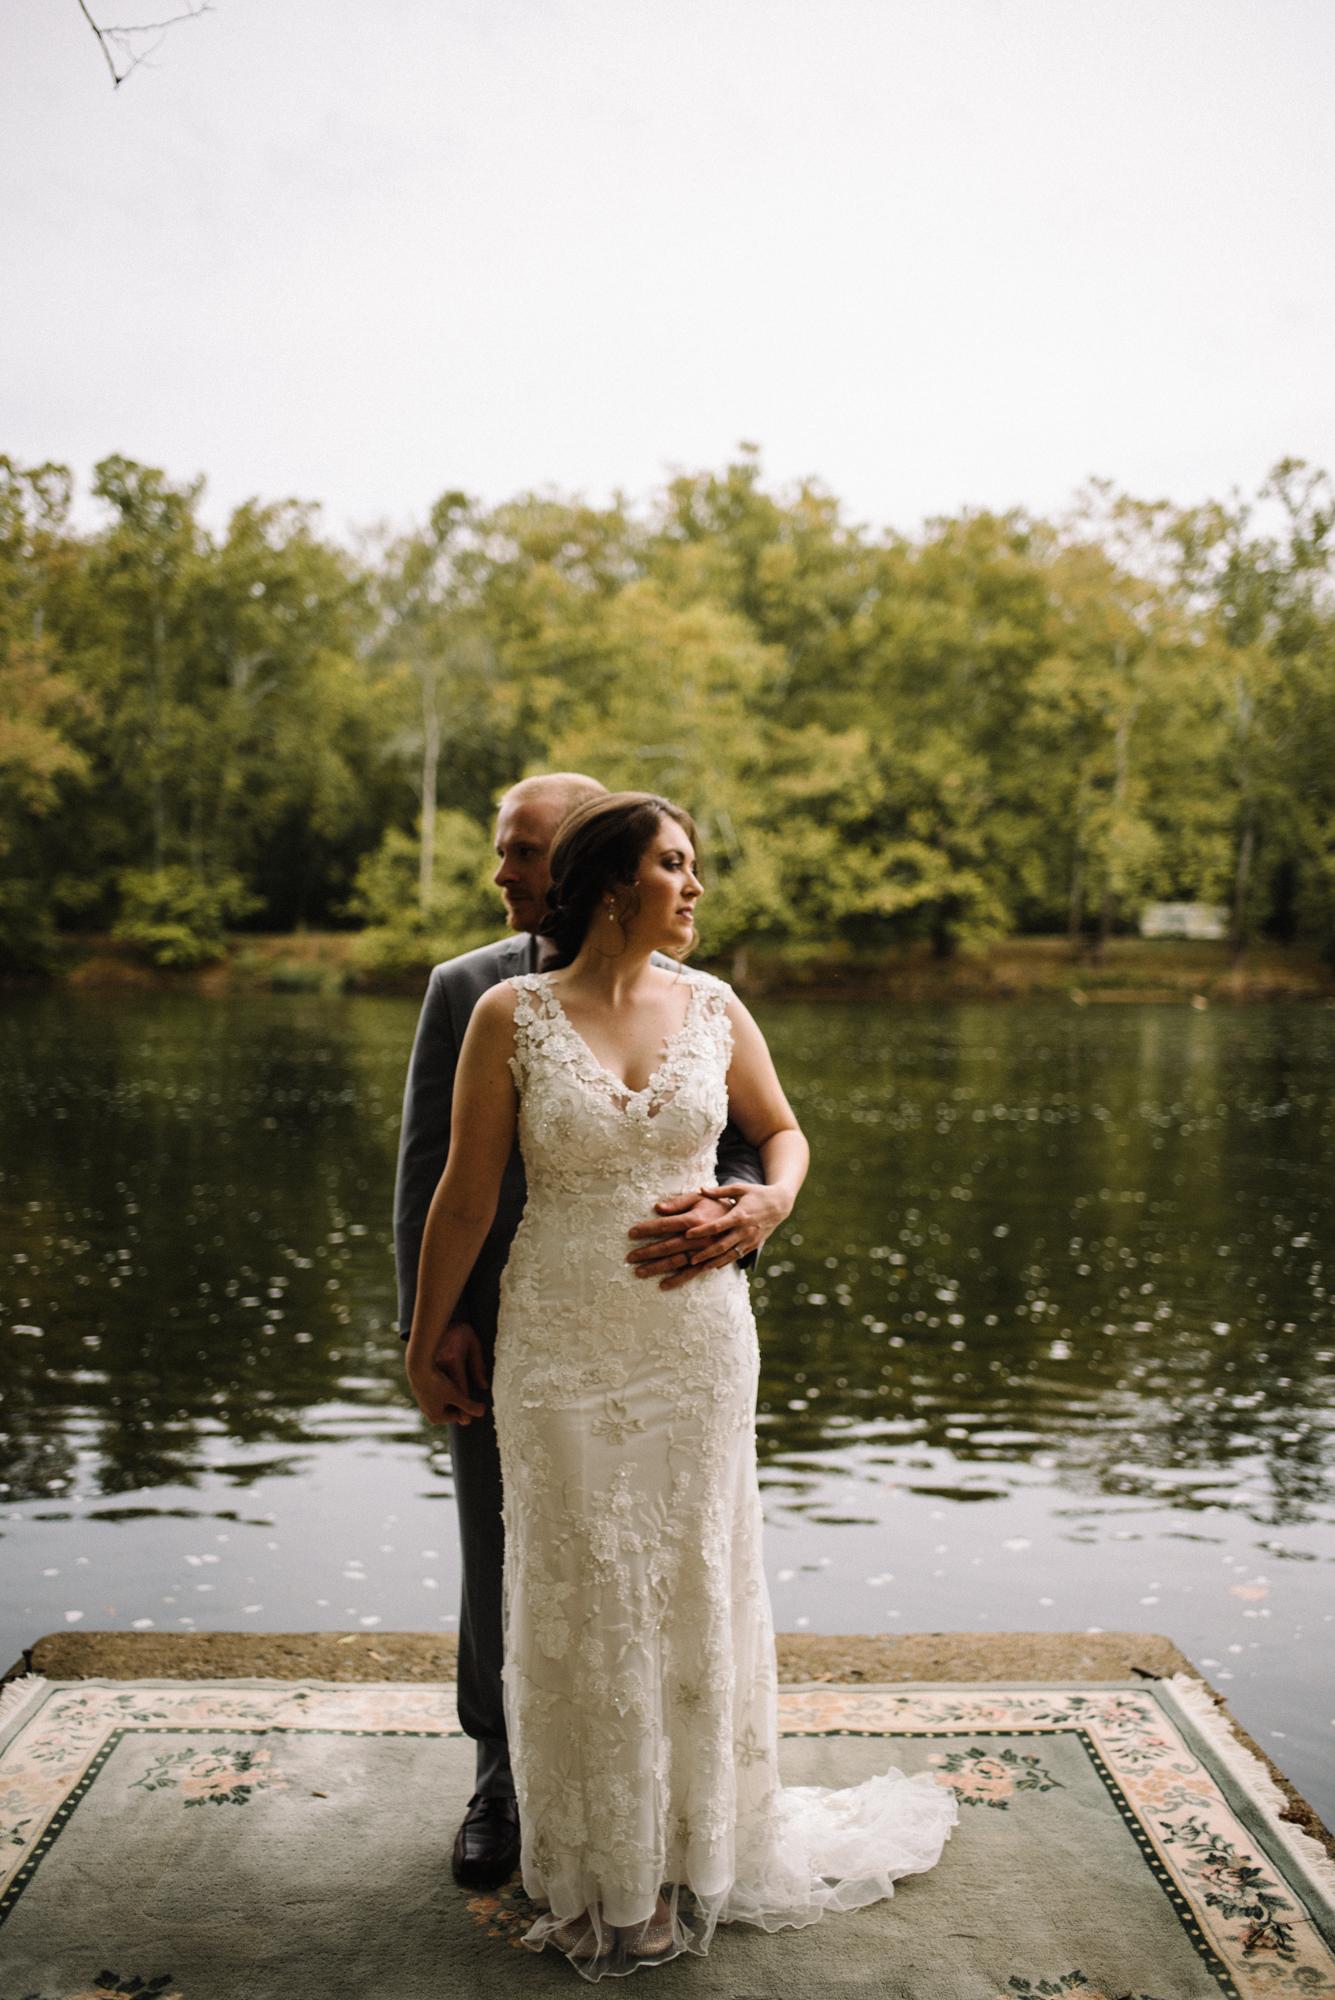 Mandi-and-Jordan-Intimate-Backyard-River-Wedding-Shenandoah-Valley_50.JPG